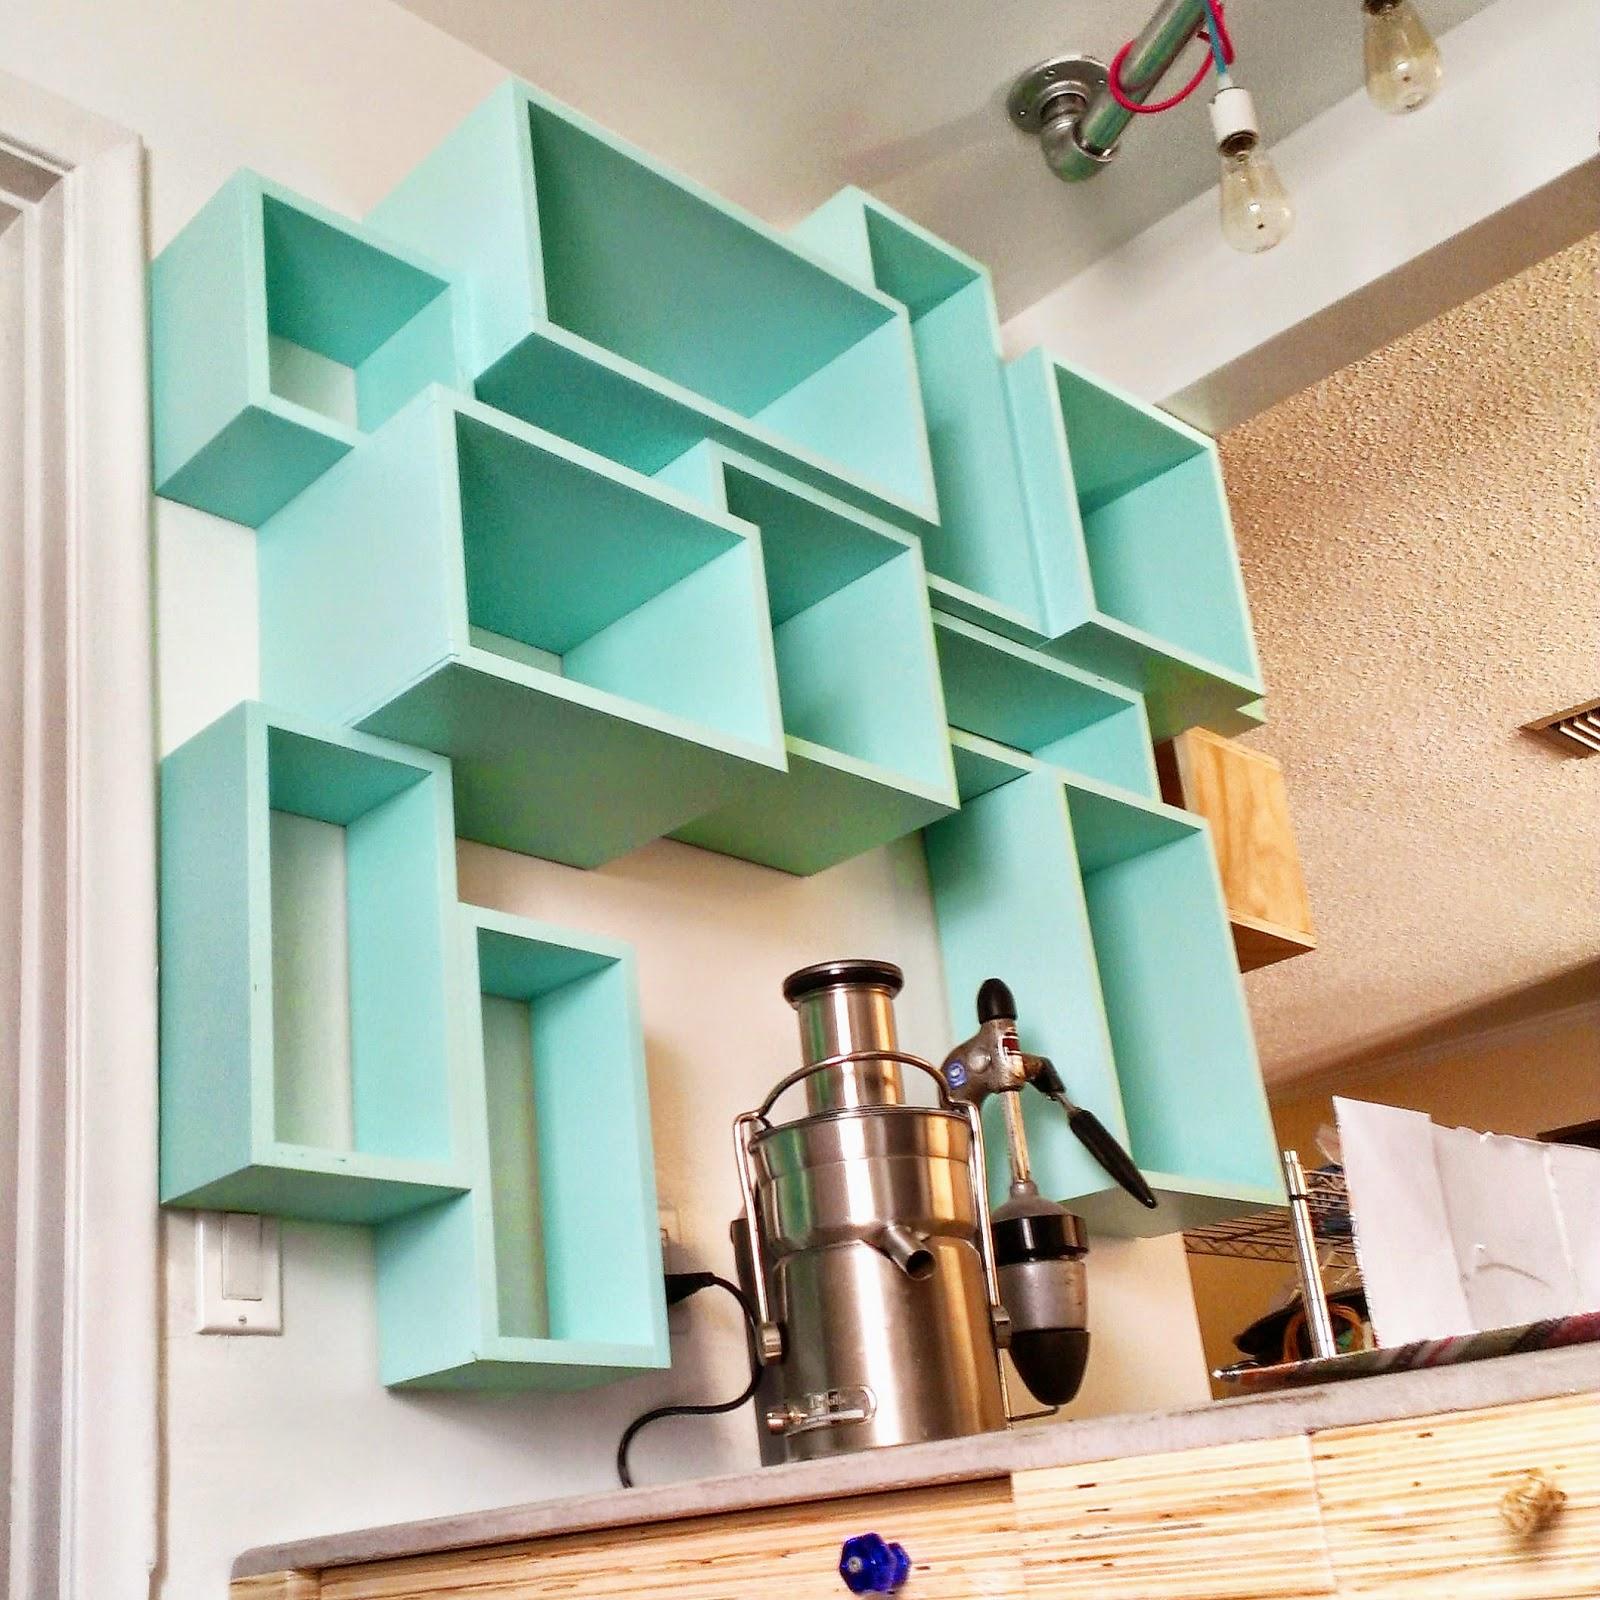 The Conversation Piece Workshop Concrete Plywood And